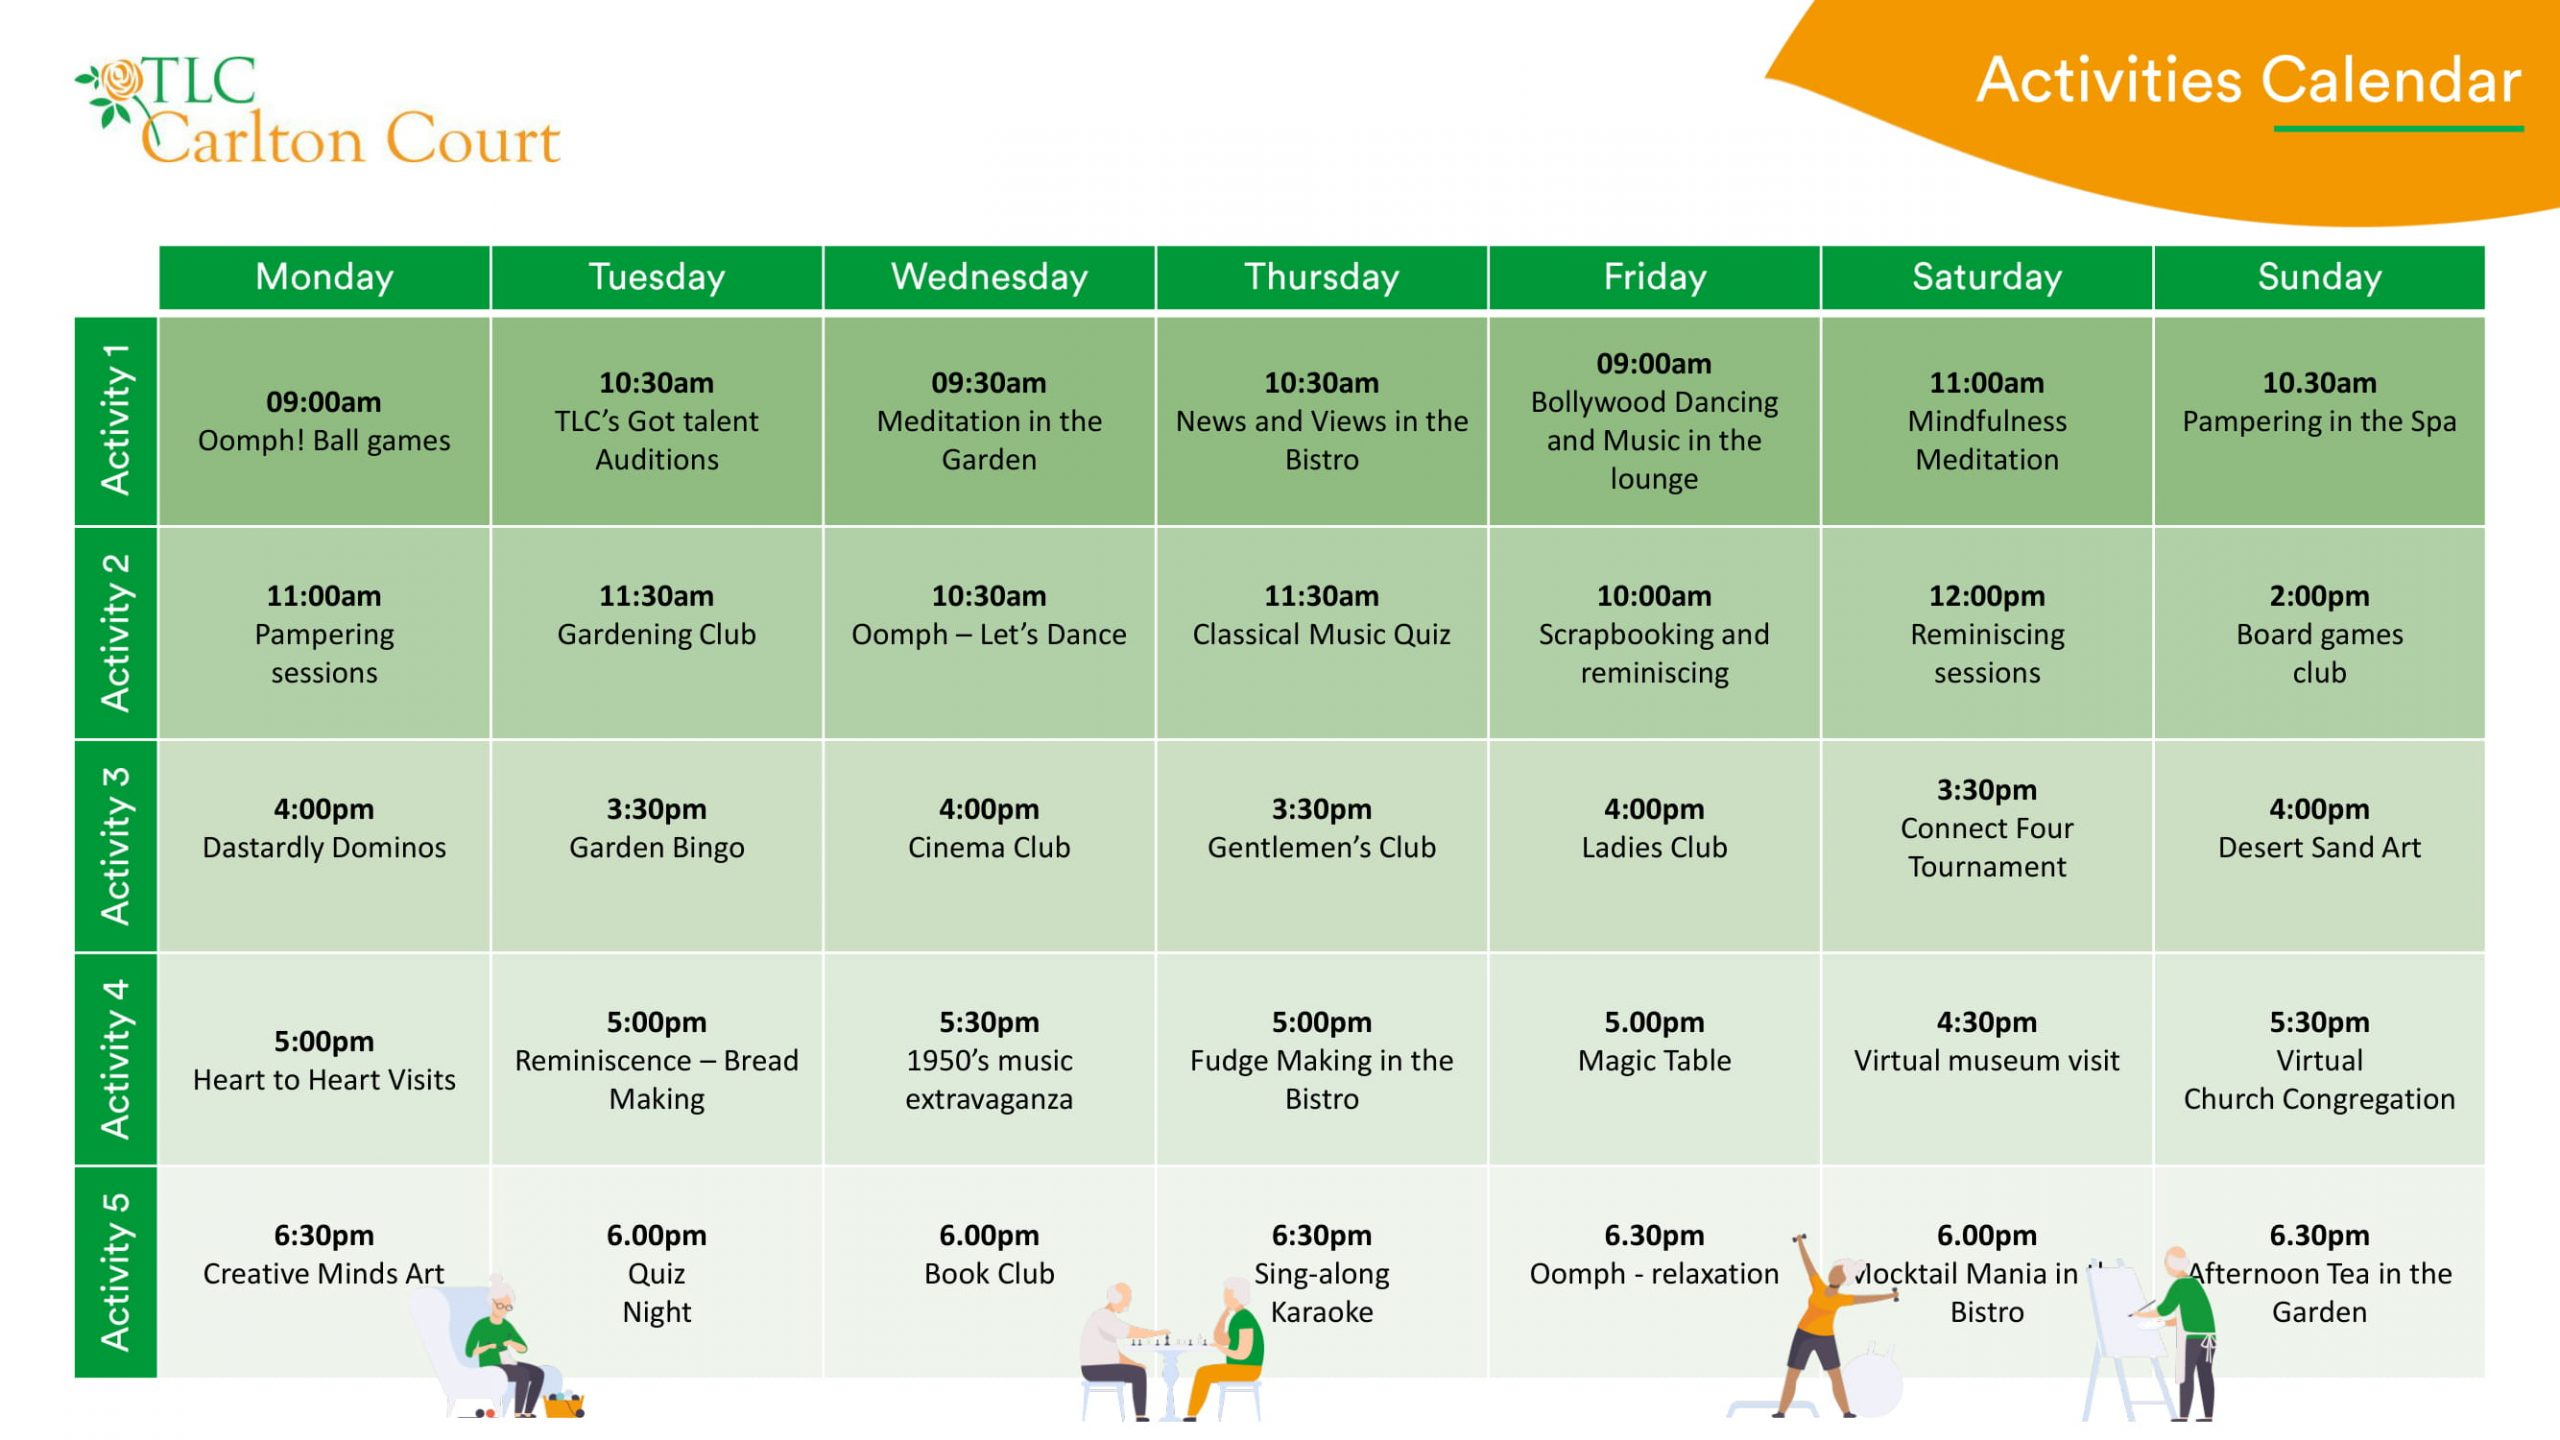 Carlton activities calendar